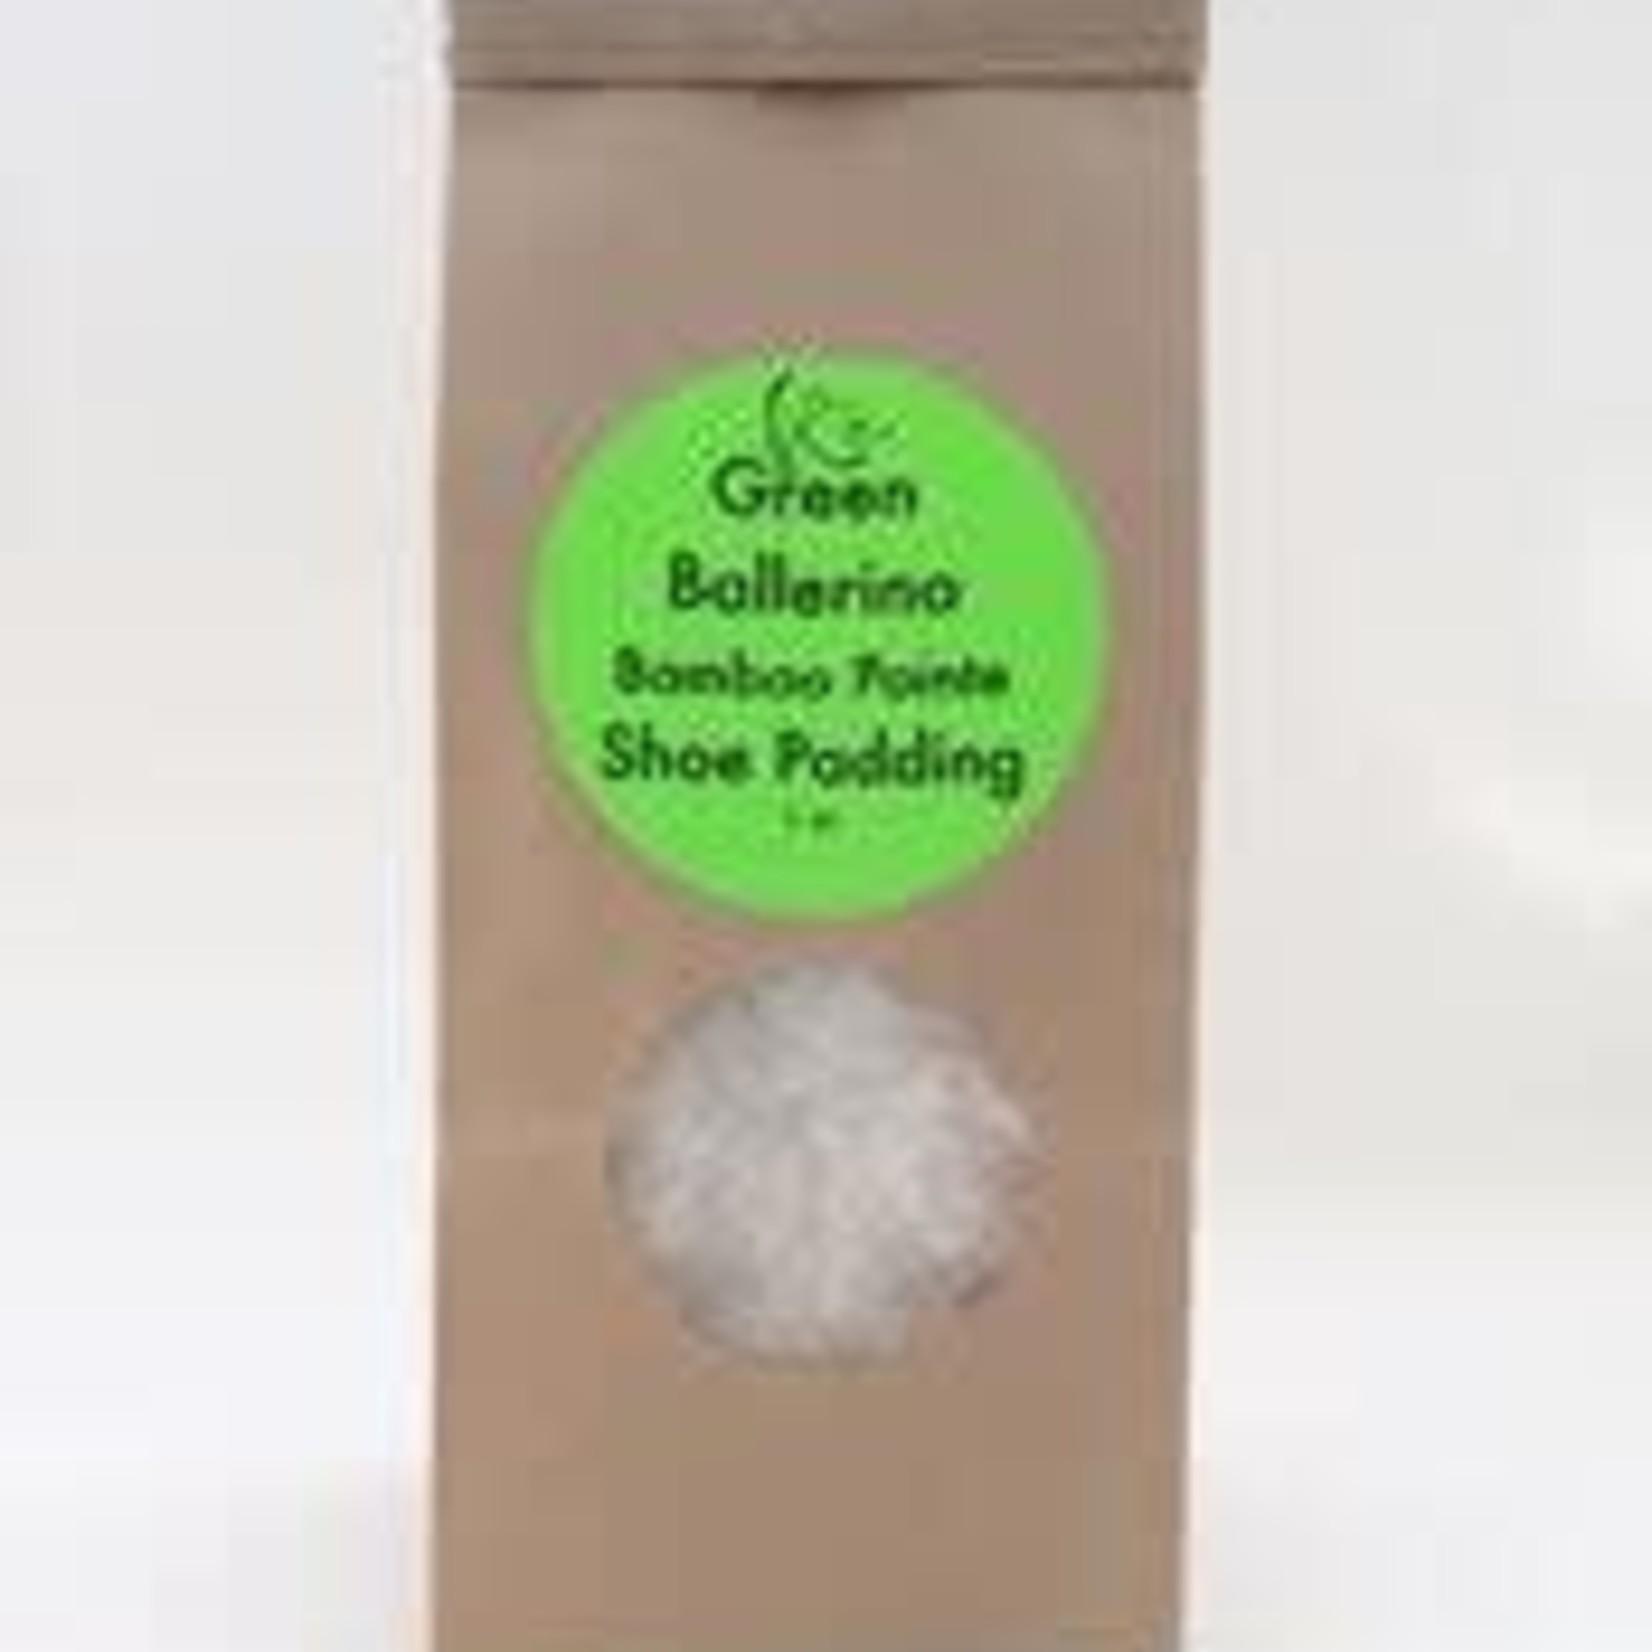 Pointe Snaps Pointe Snaps Green Ballerina Bamboo Pointe Shoe Padding